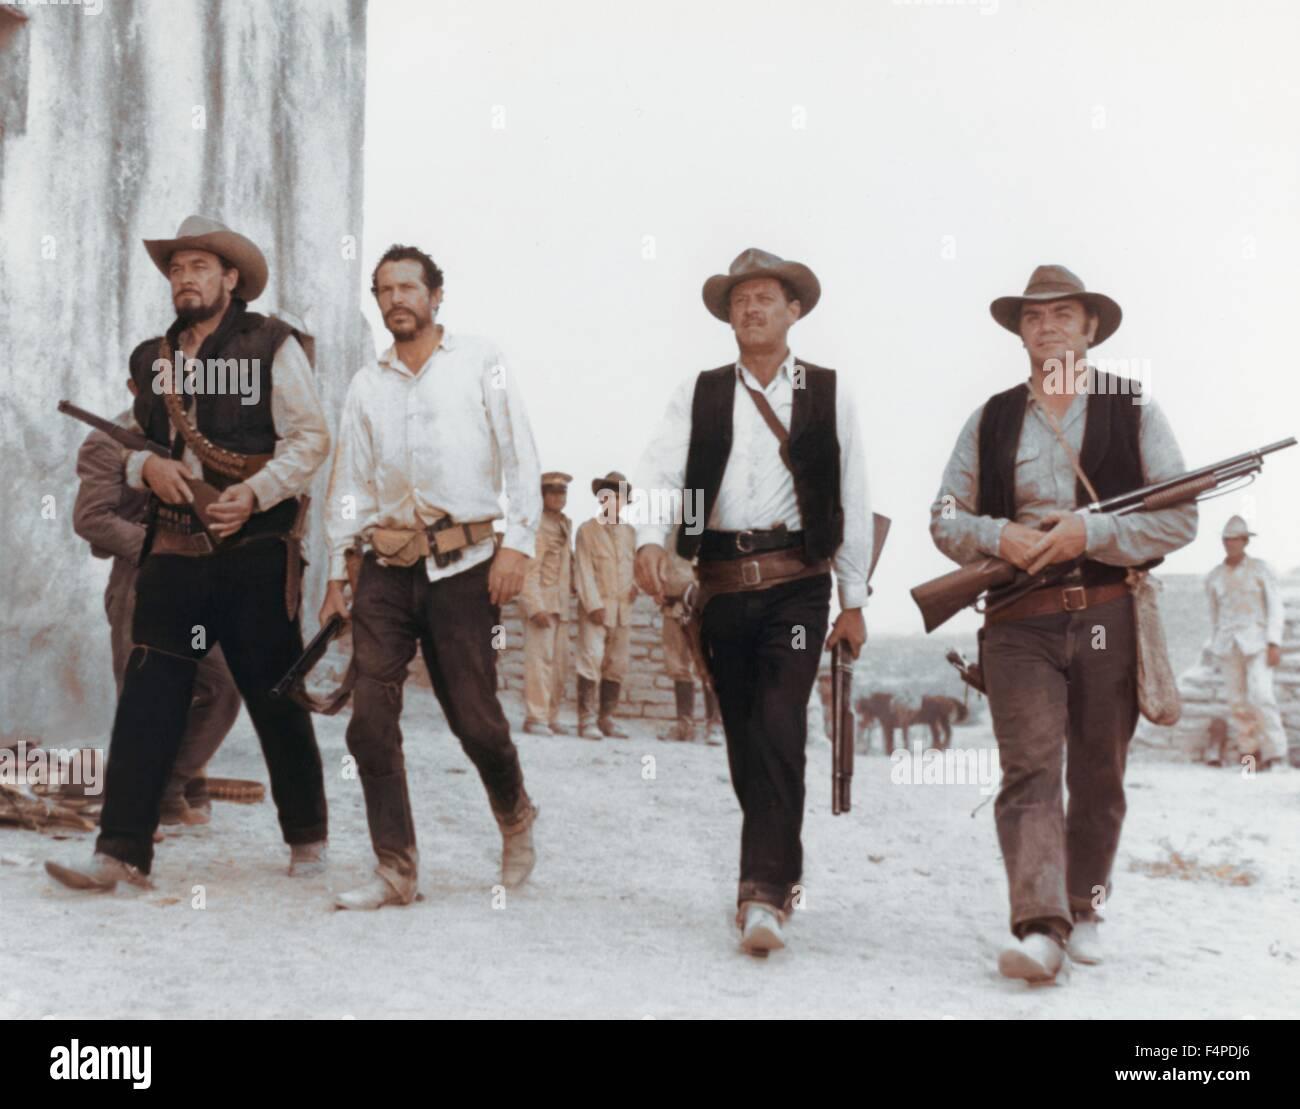 Ben Johnson, Warren Oates, William Holden, Ernest Borgnine / The Wild Bunch 1969 directed by Sam Peckinpah - Stock Image